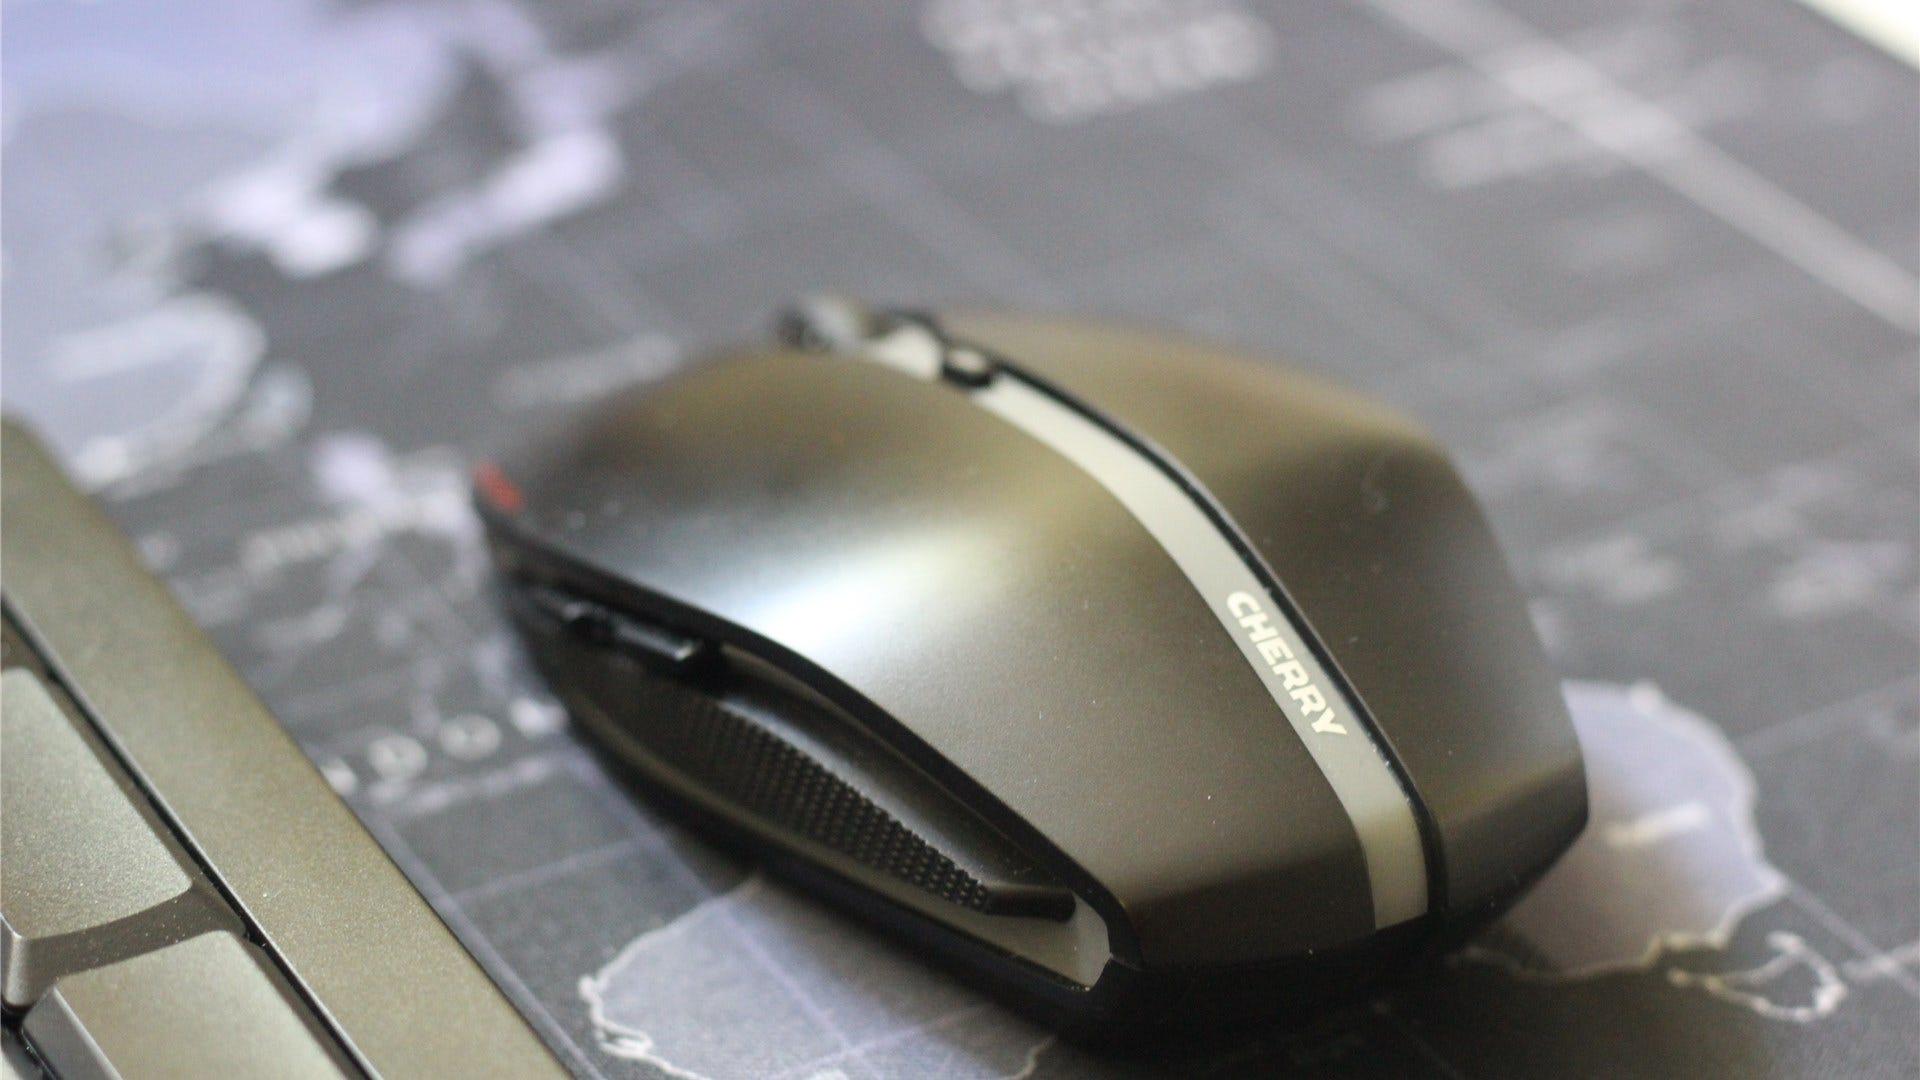 Cherry Gentix Mouse